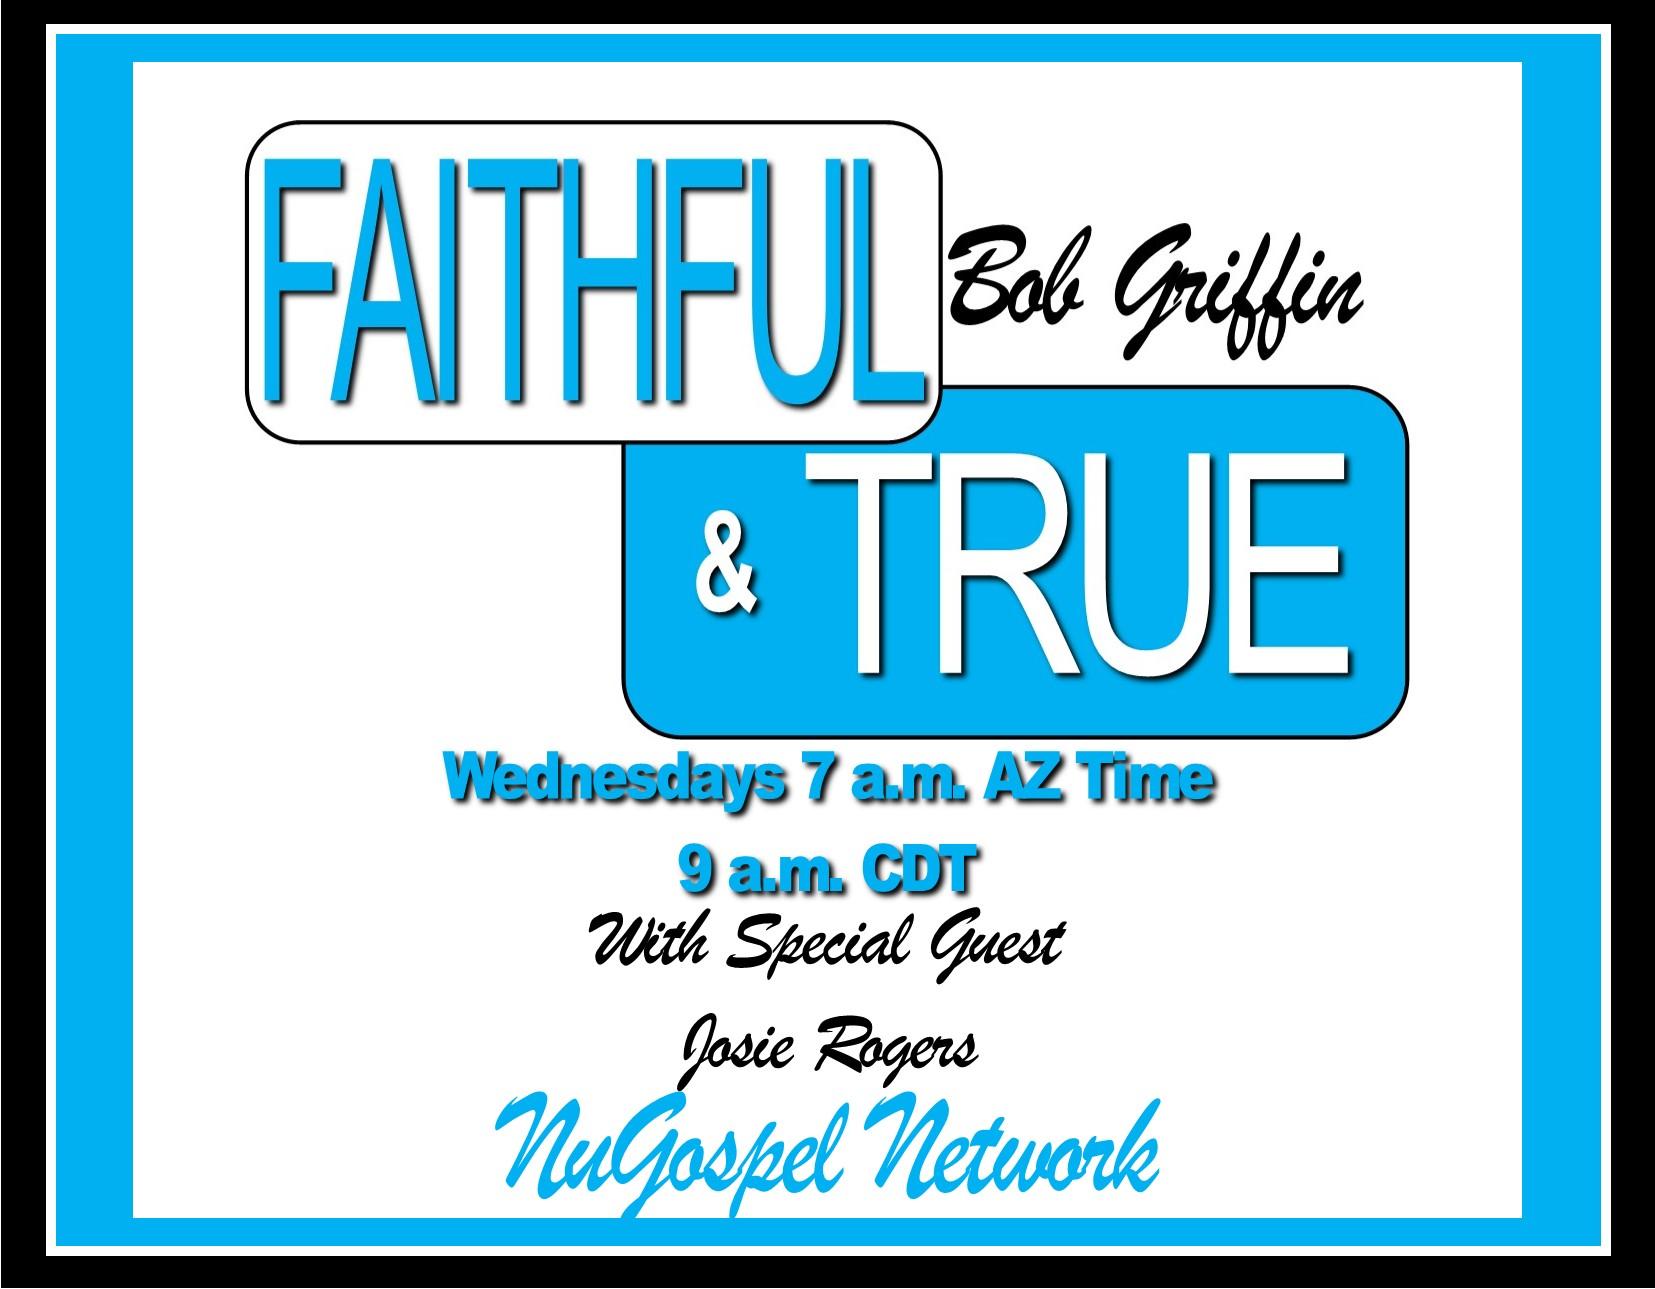 Faithful & True with Bob Griffin